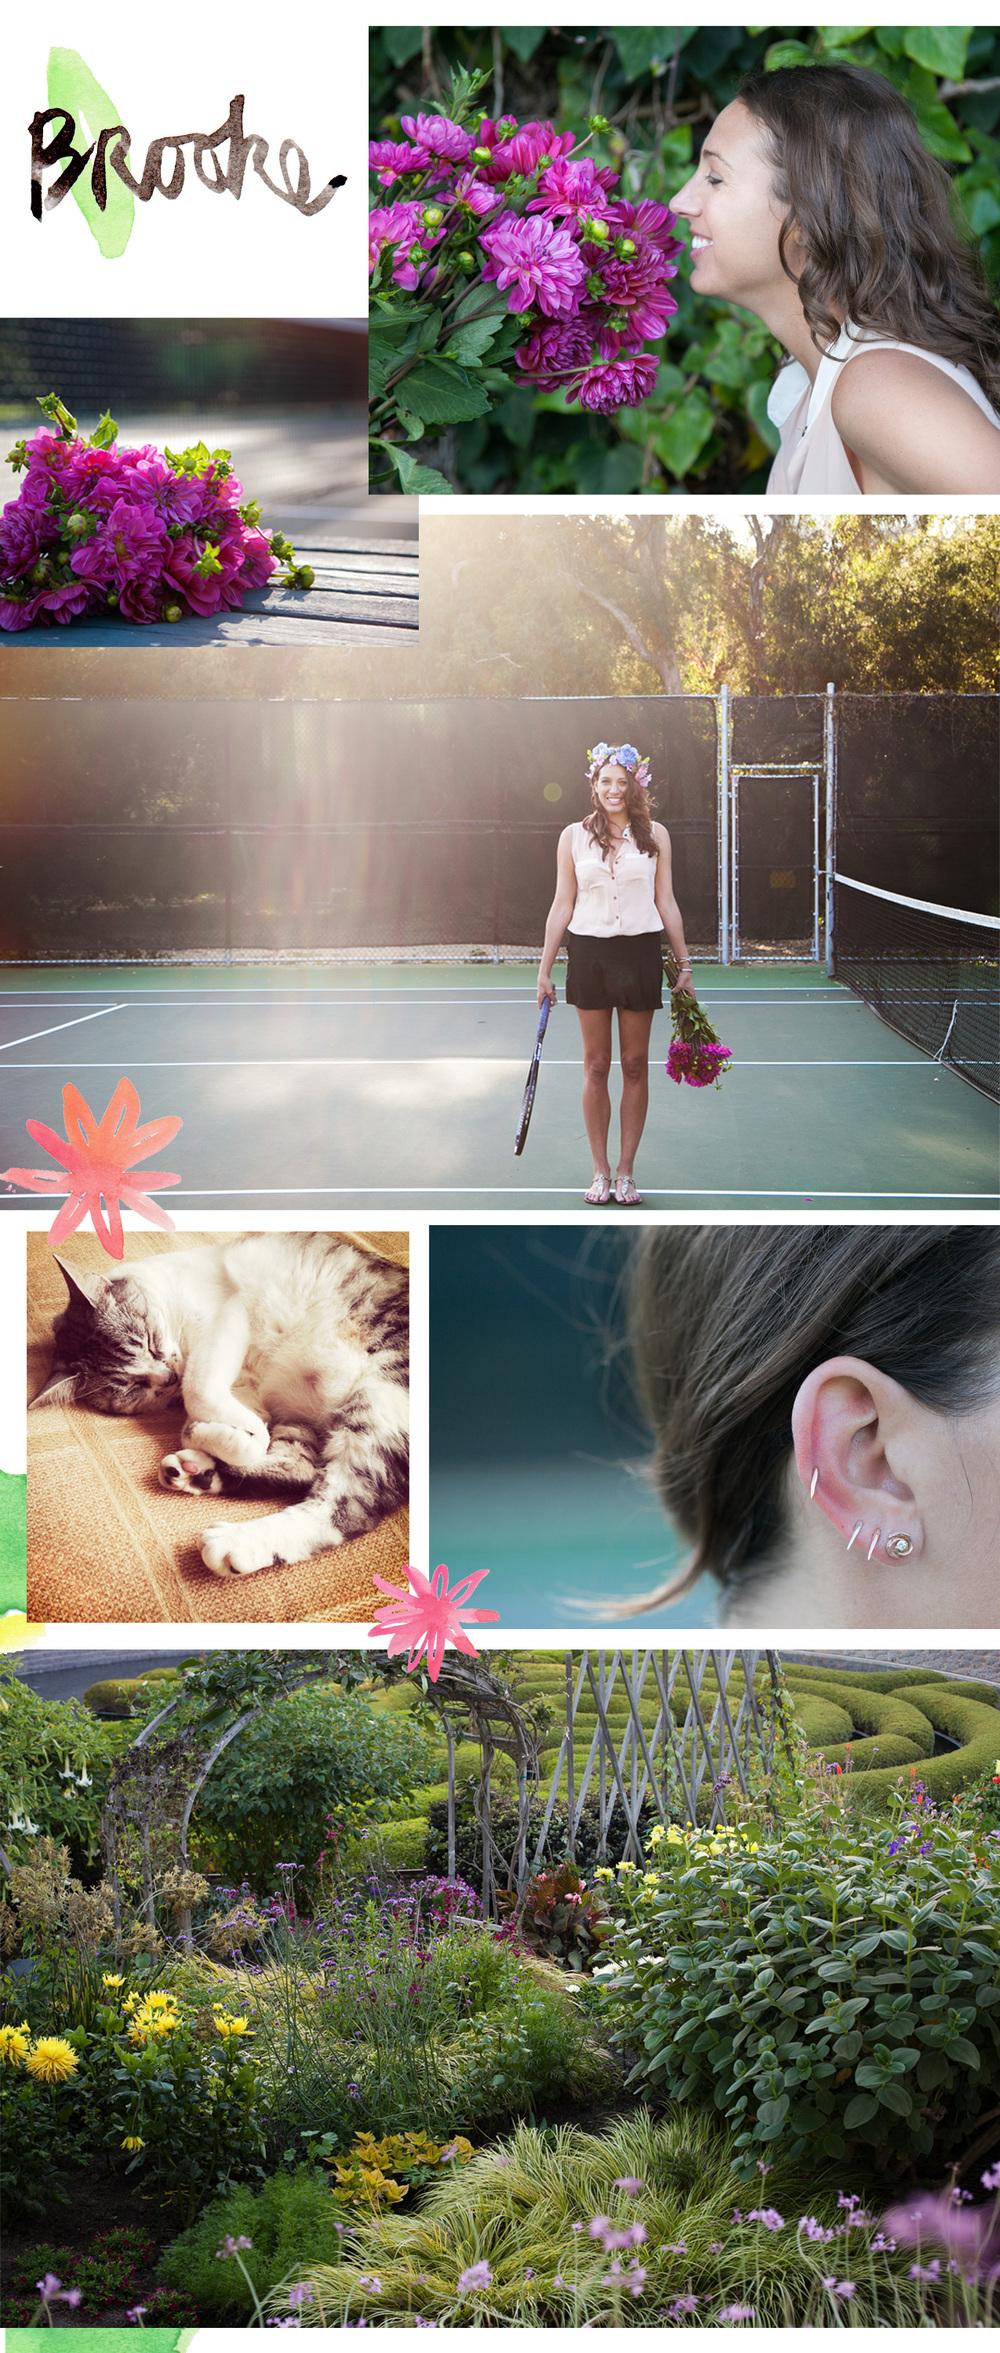 Naomi-Yamada-profiles-Brooke-Borisoff-Part-ONE.jpg